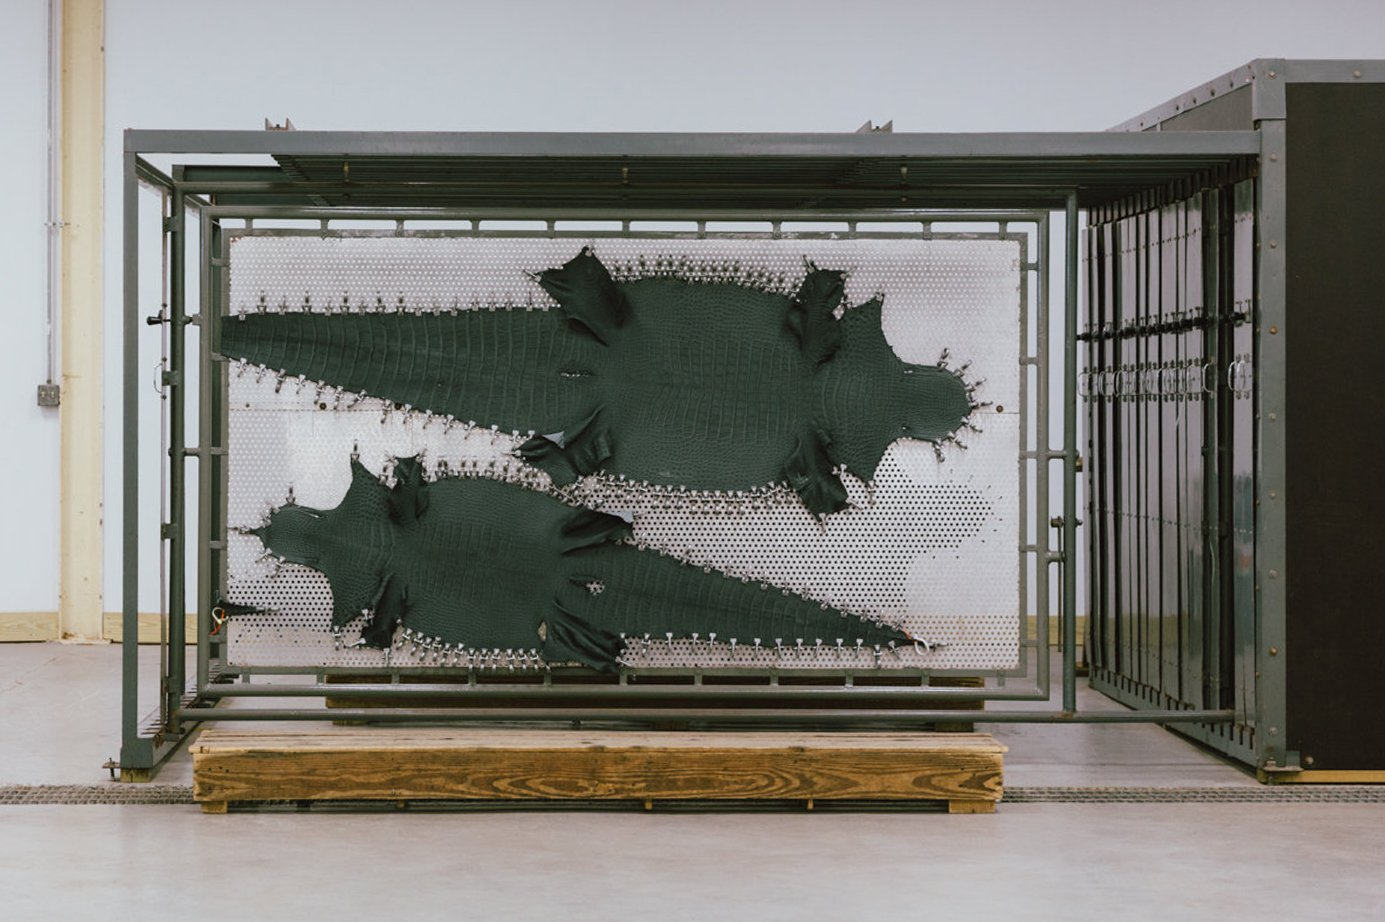 American Alligator Frank Clegg 10 1